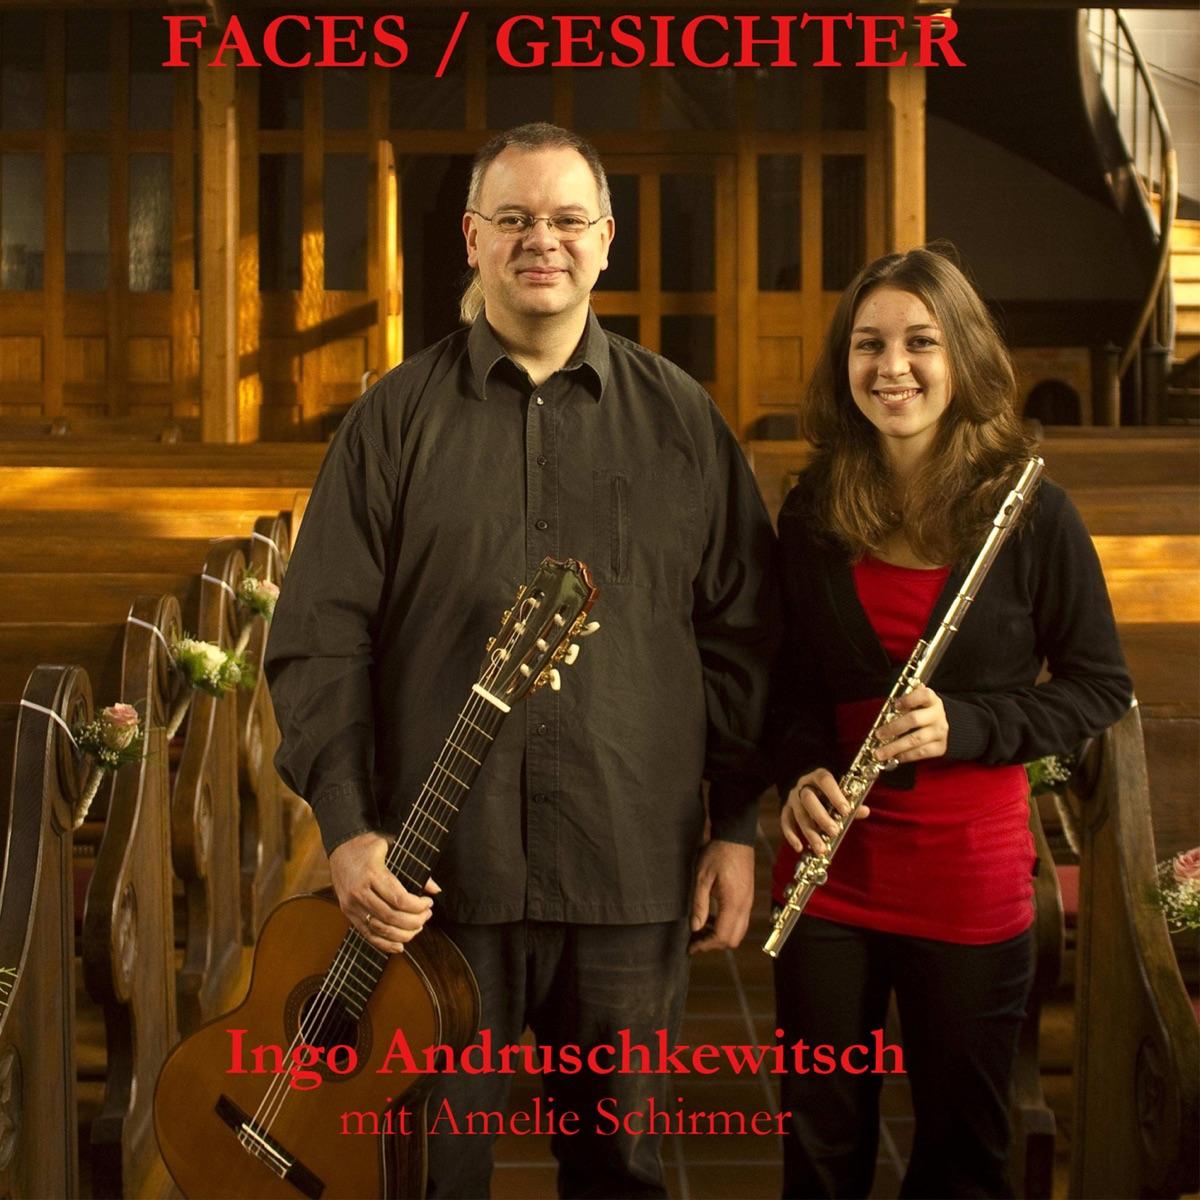 Faces  Gesichter Ingo Andruschkewitsch  Amelie Schirmer CD cover